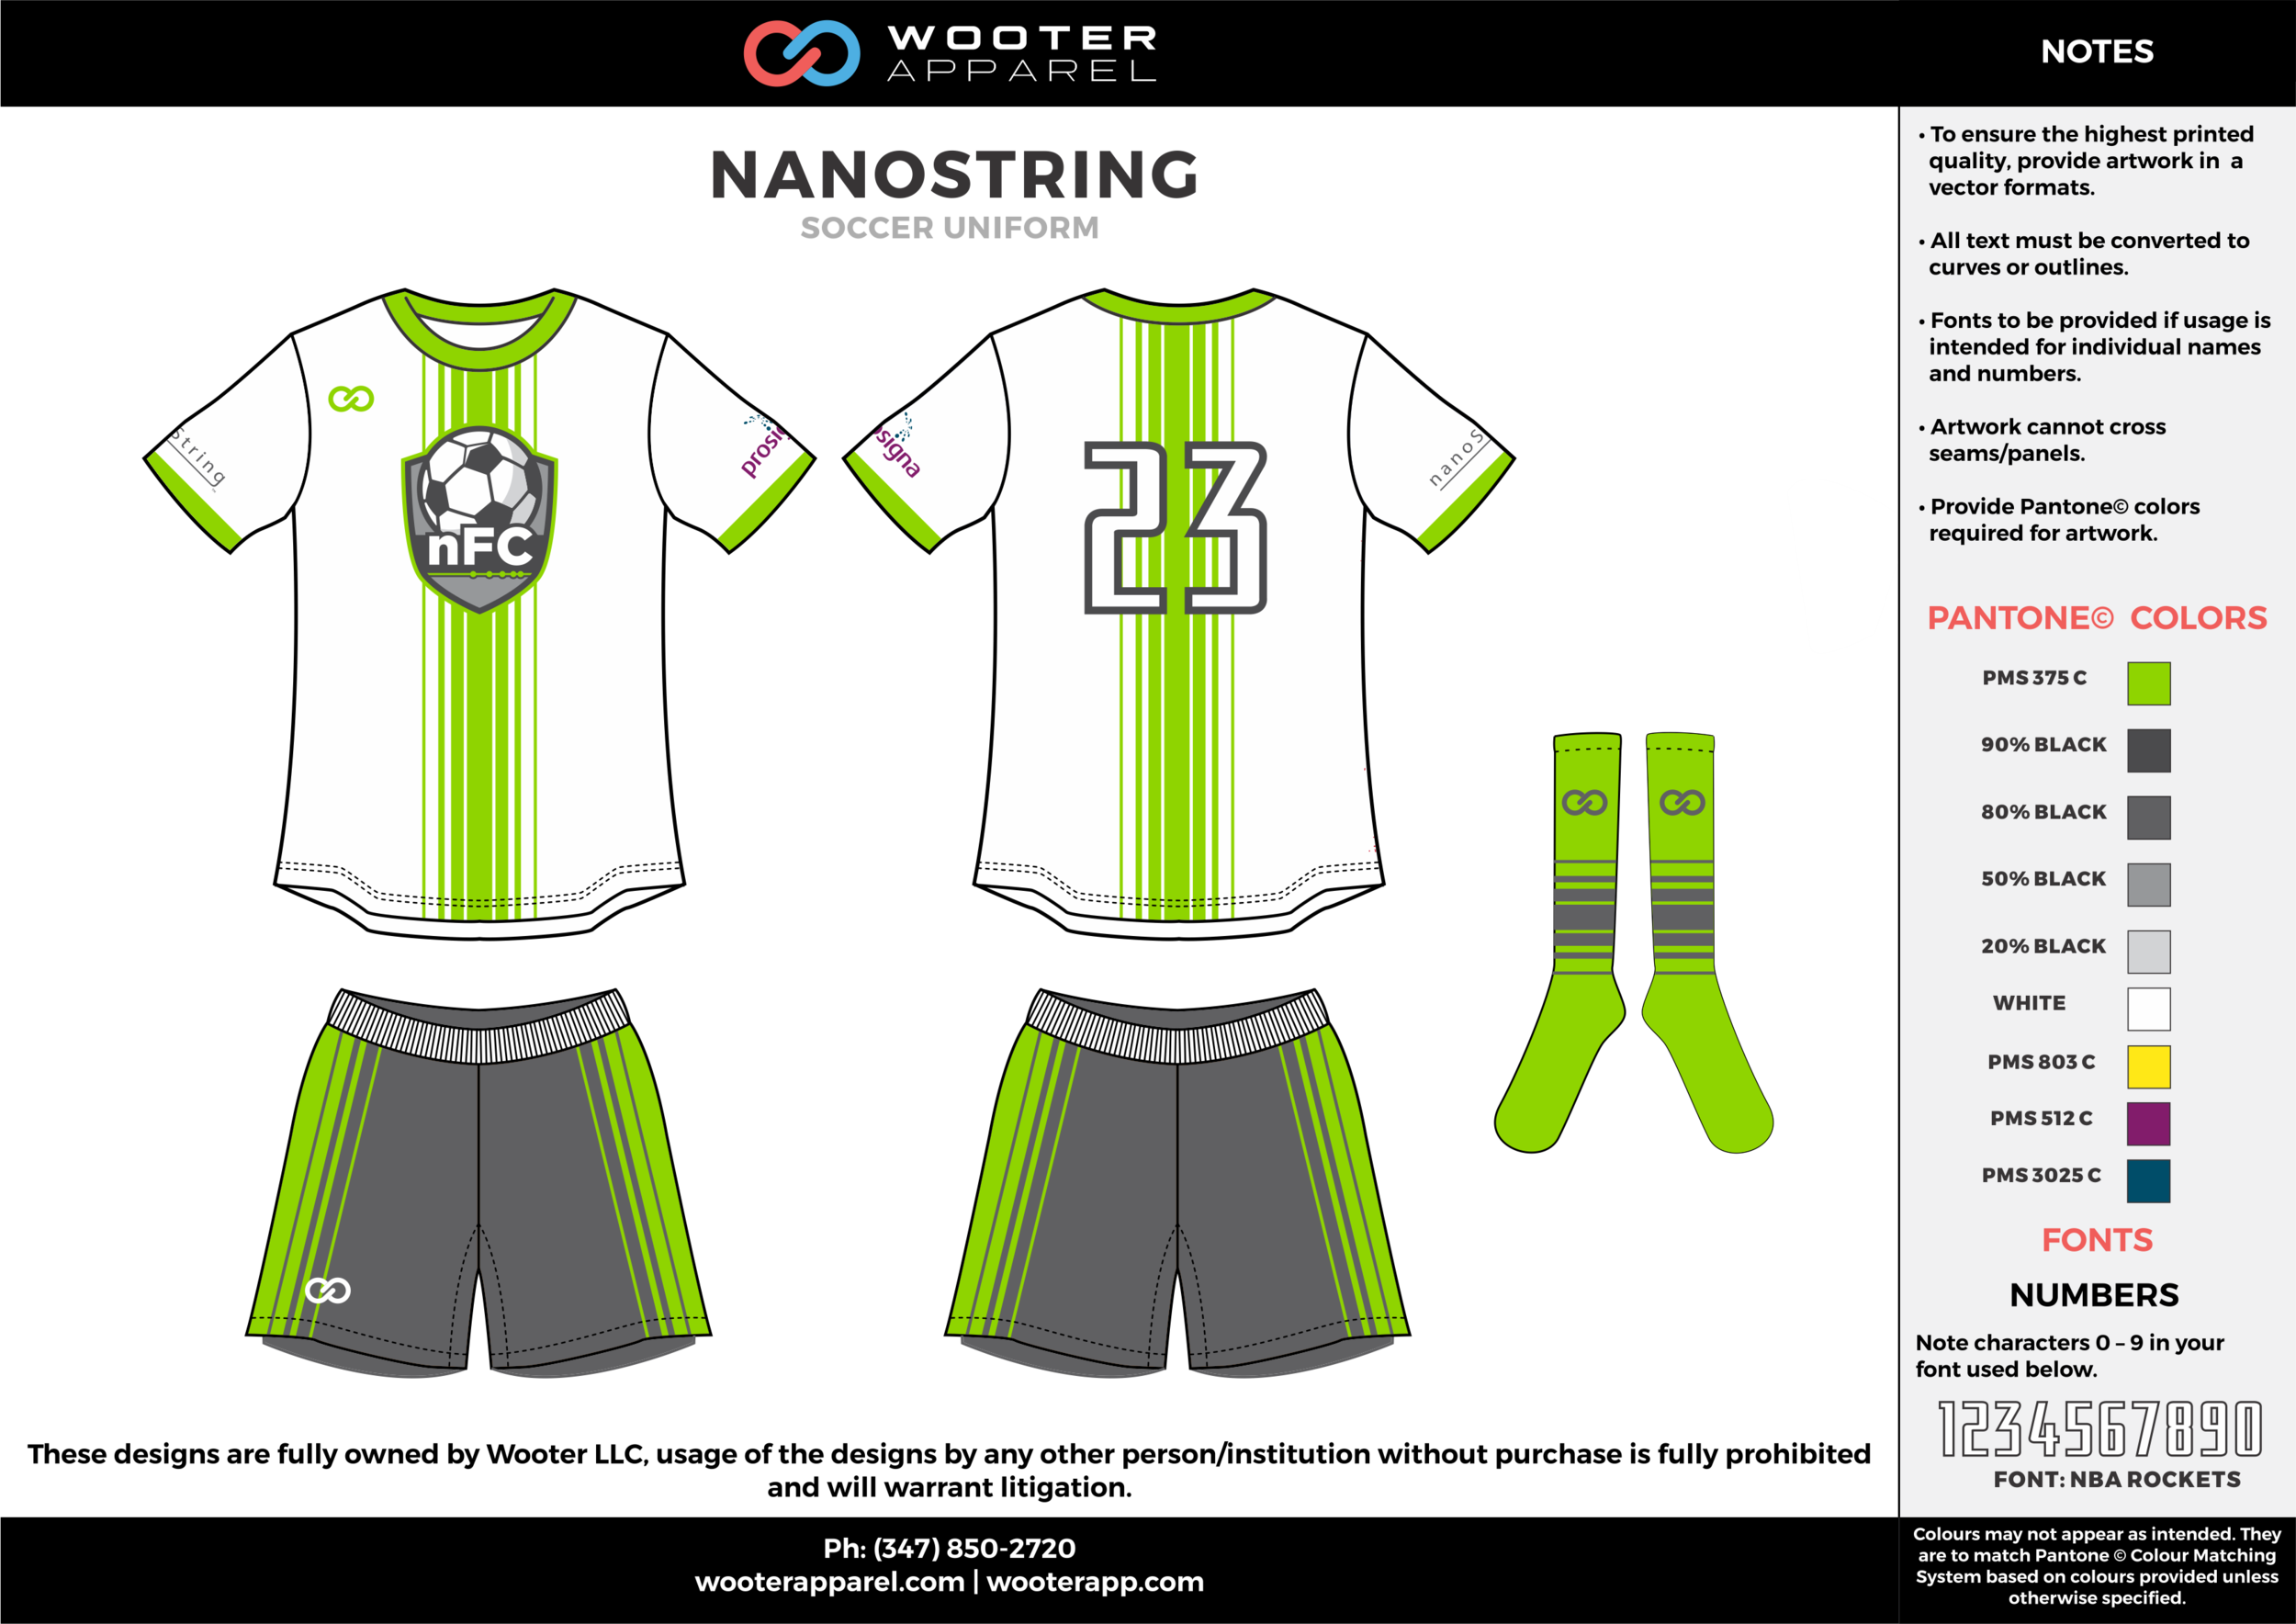 NANOSTRING white green gray custom sublimated soccer uniform jersey shirt shorts socks